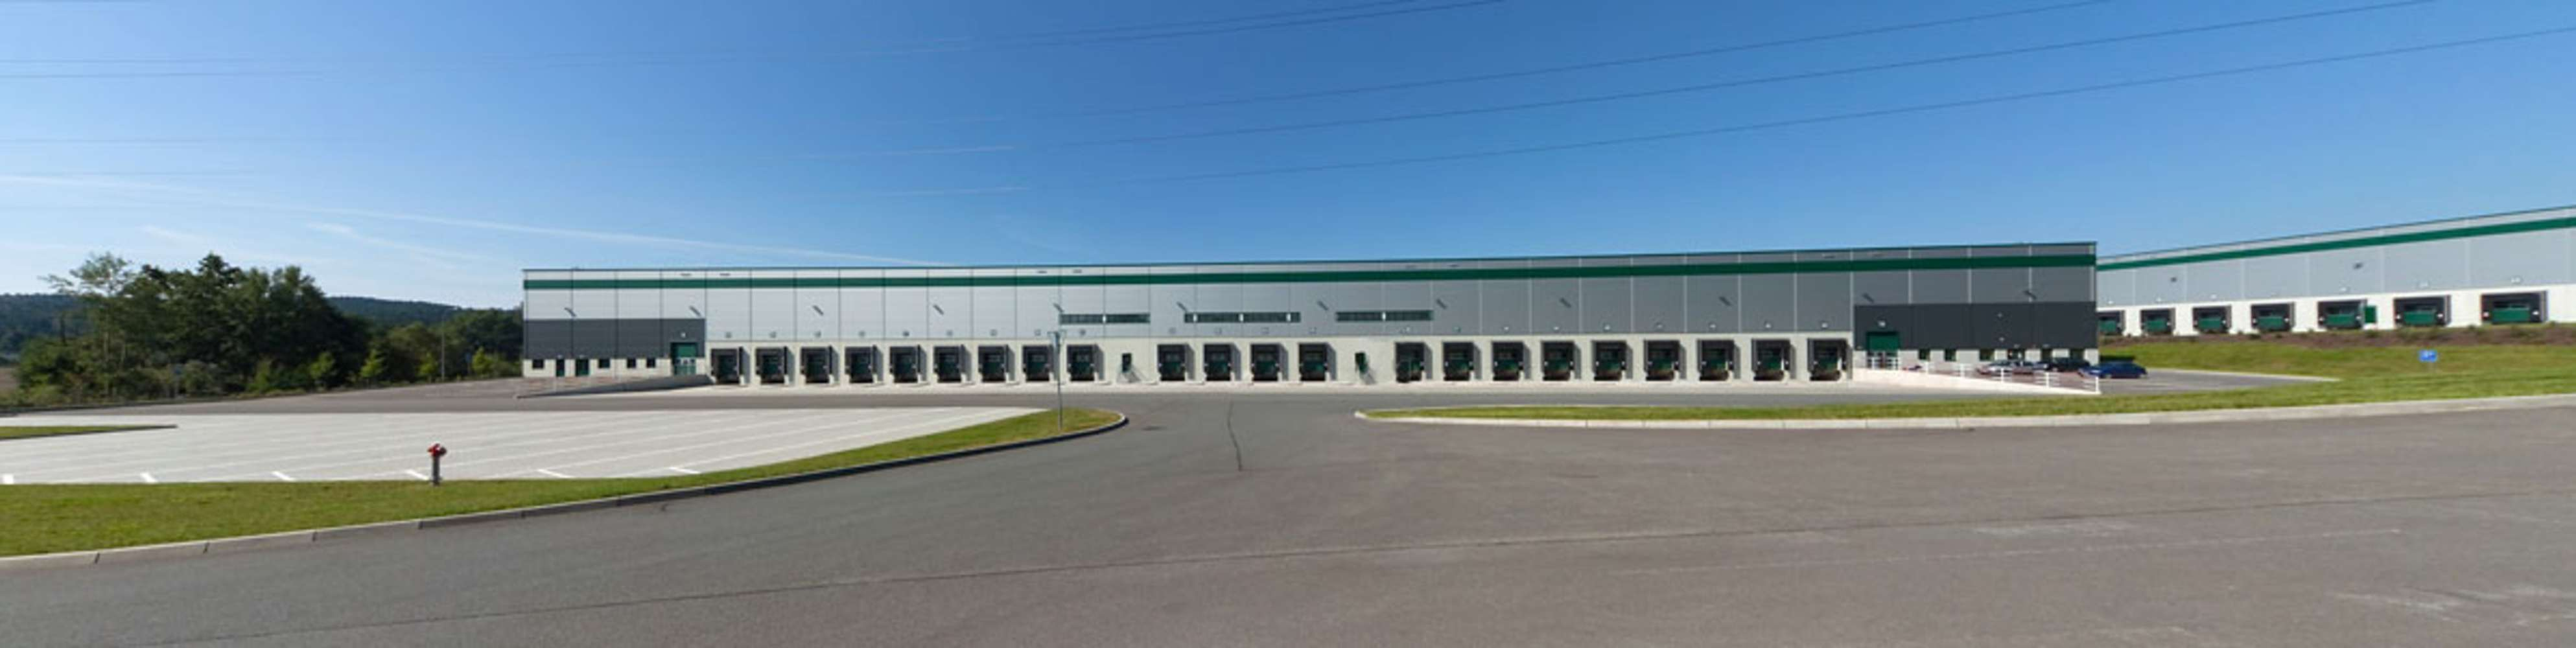 Industrial and logistics Stenovice,  - Prologis Park Pilsen-Štěnovice